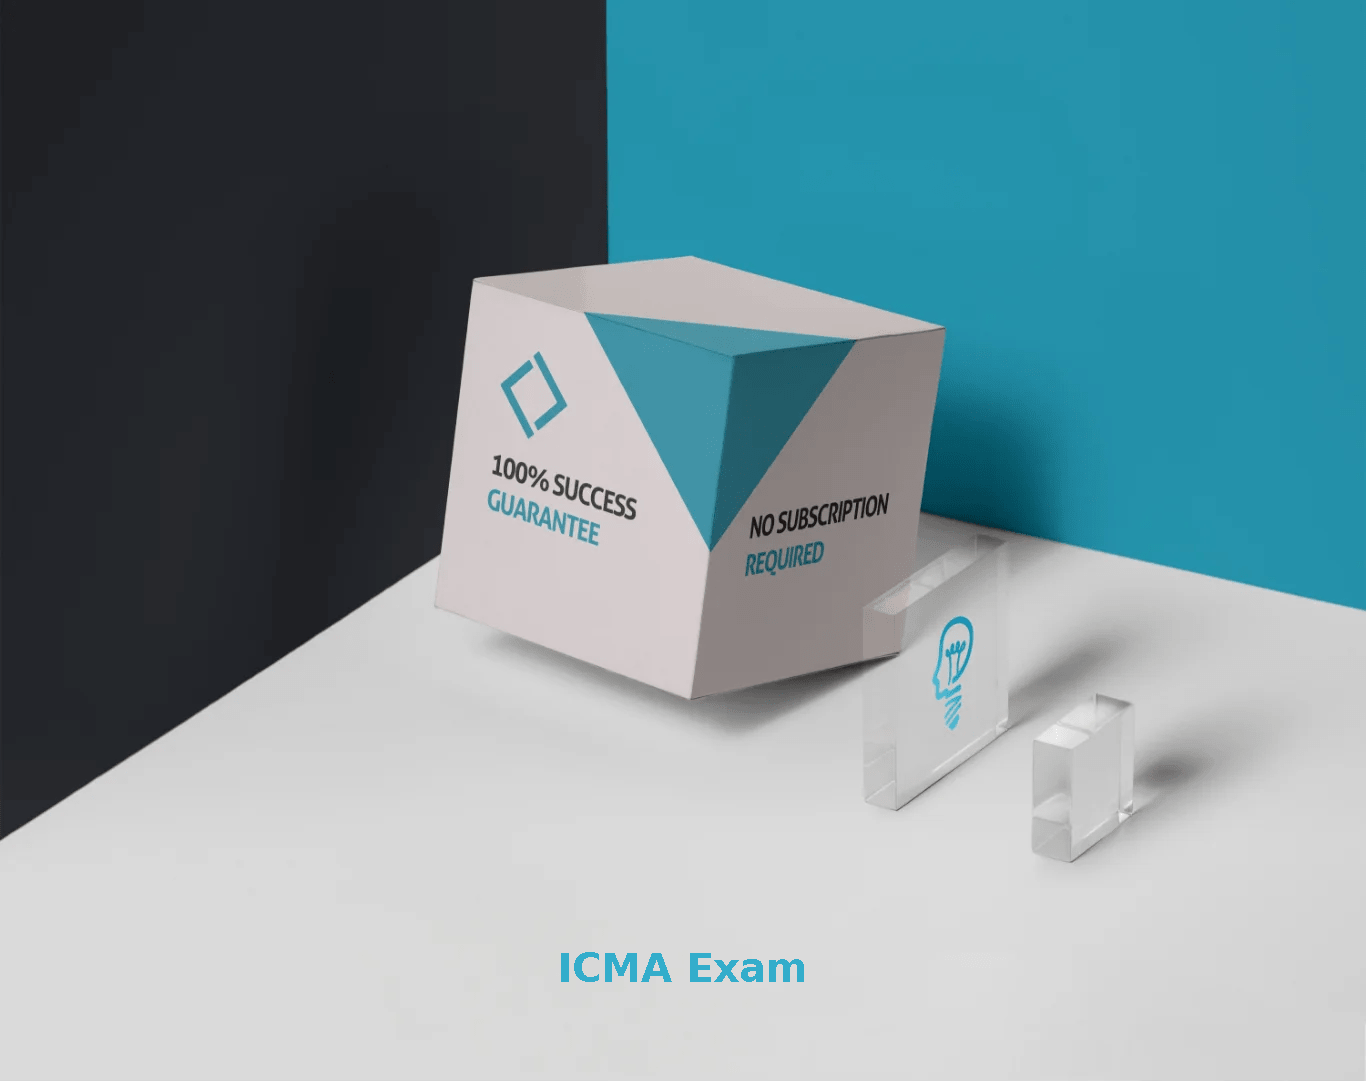 ICMA Exam Dumps